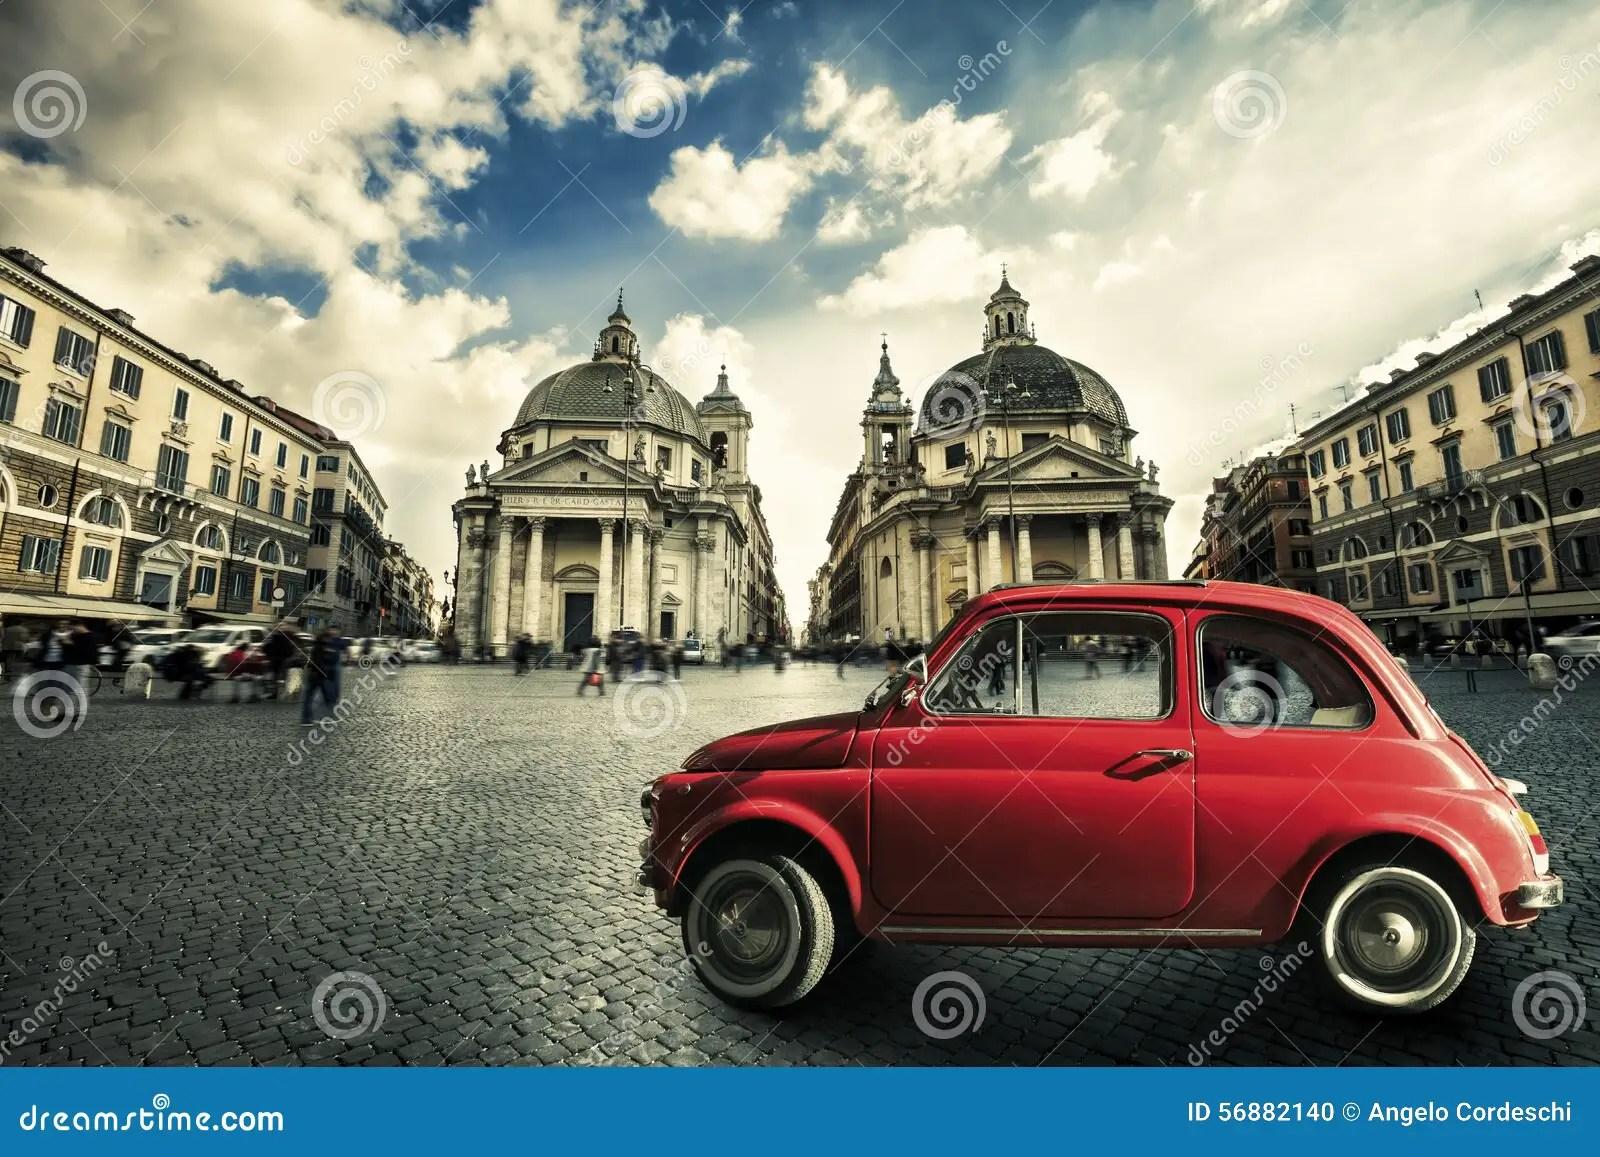 All Cars Symbols Wallpaper Old Red Vintage Car Italian Scene In The Historic Center